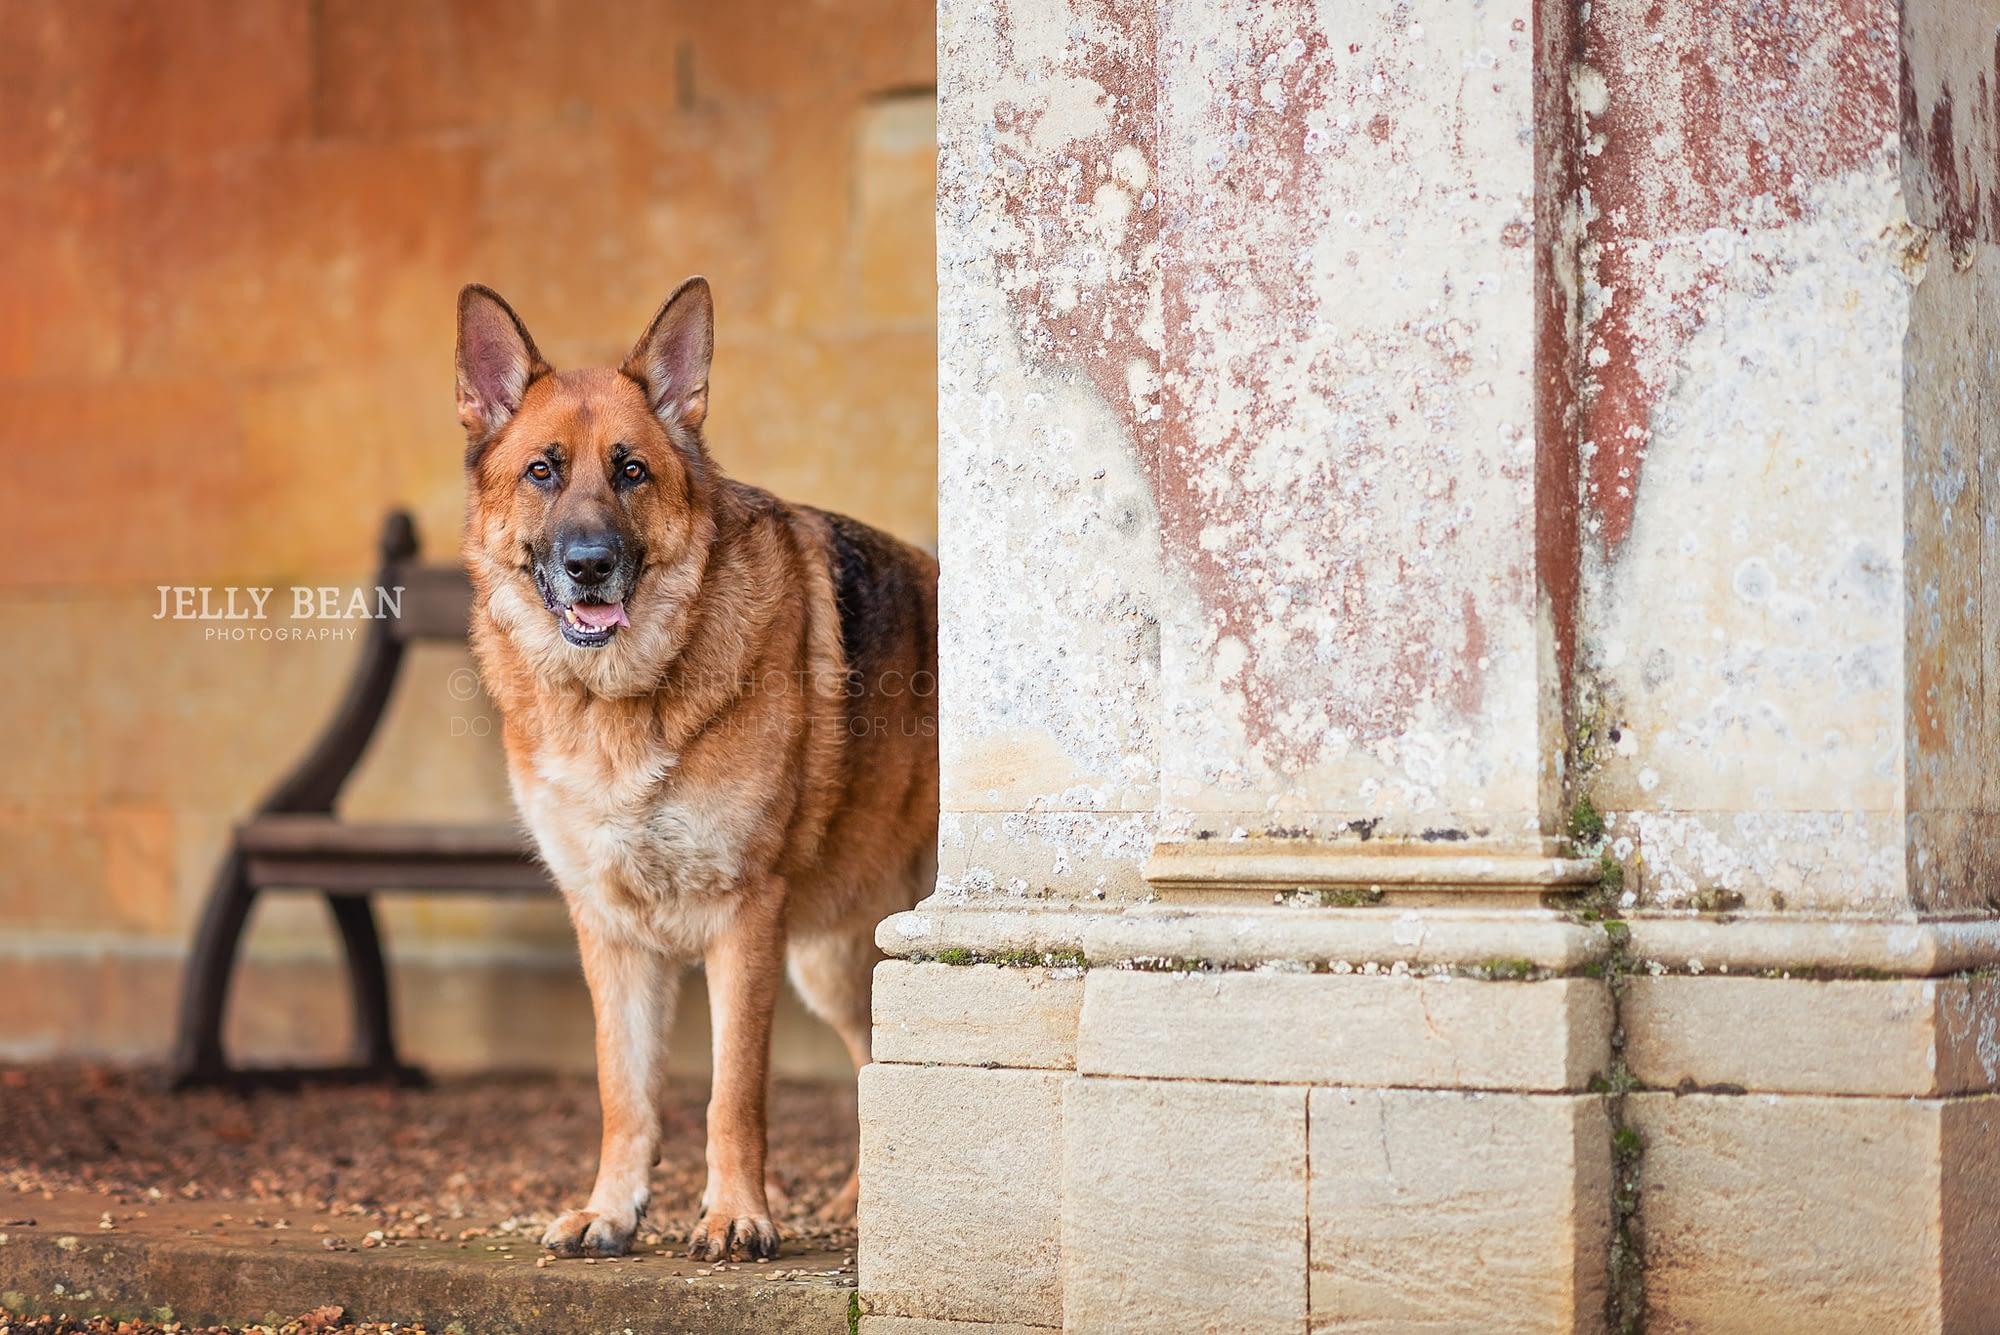 Dog standing next to pillar